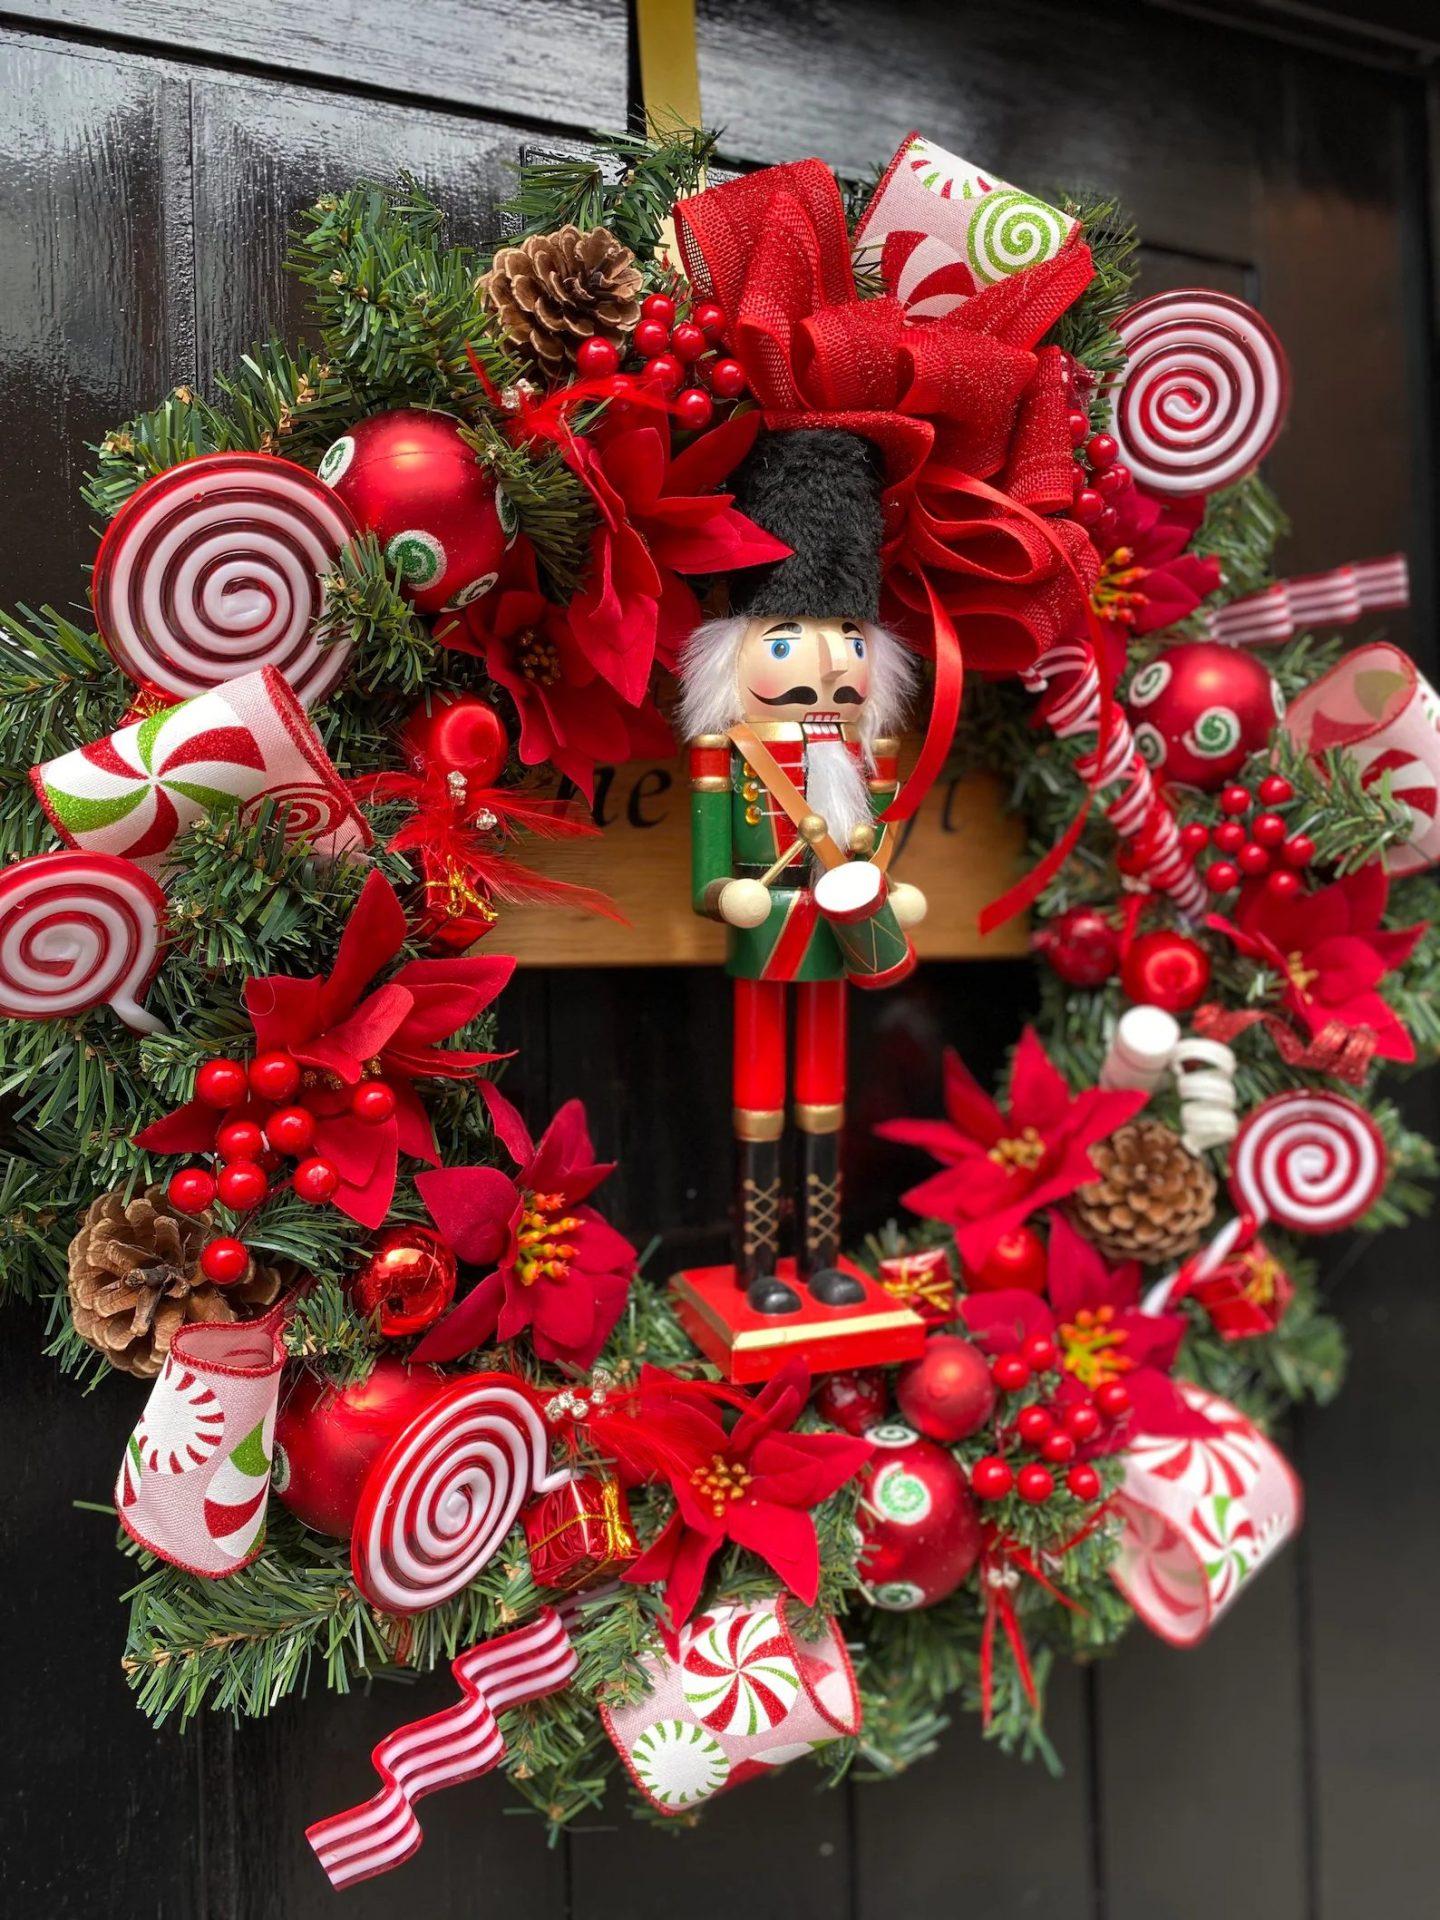 Red Nutcracker Christmas Wreath